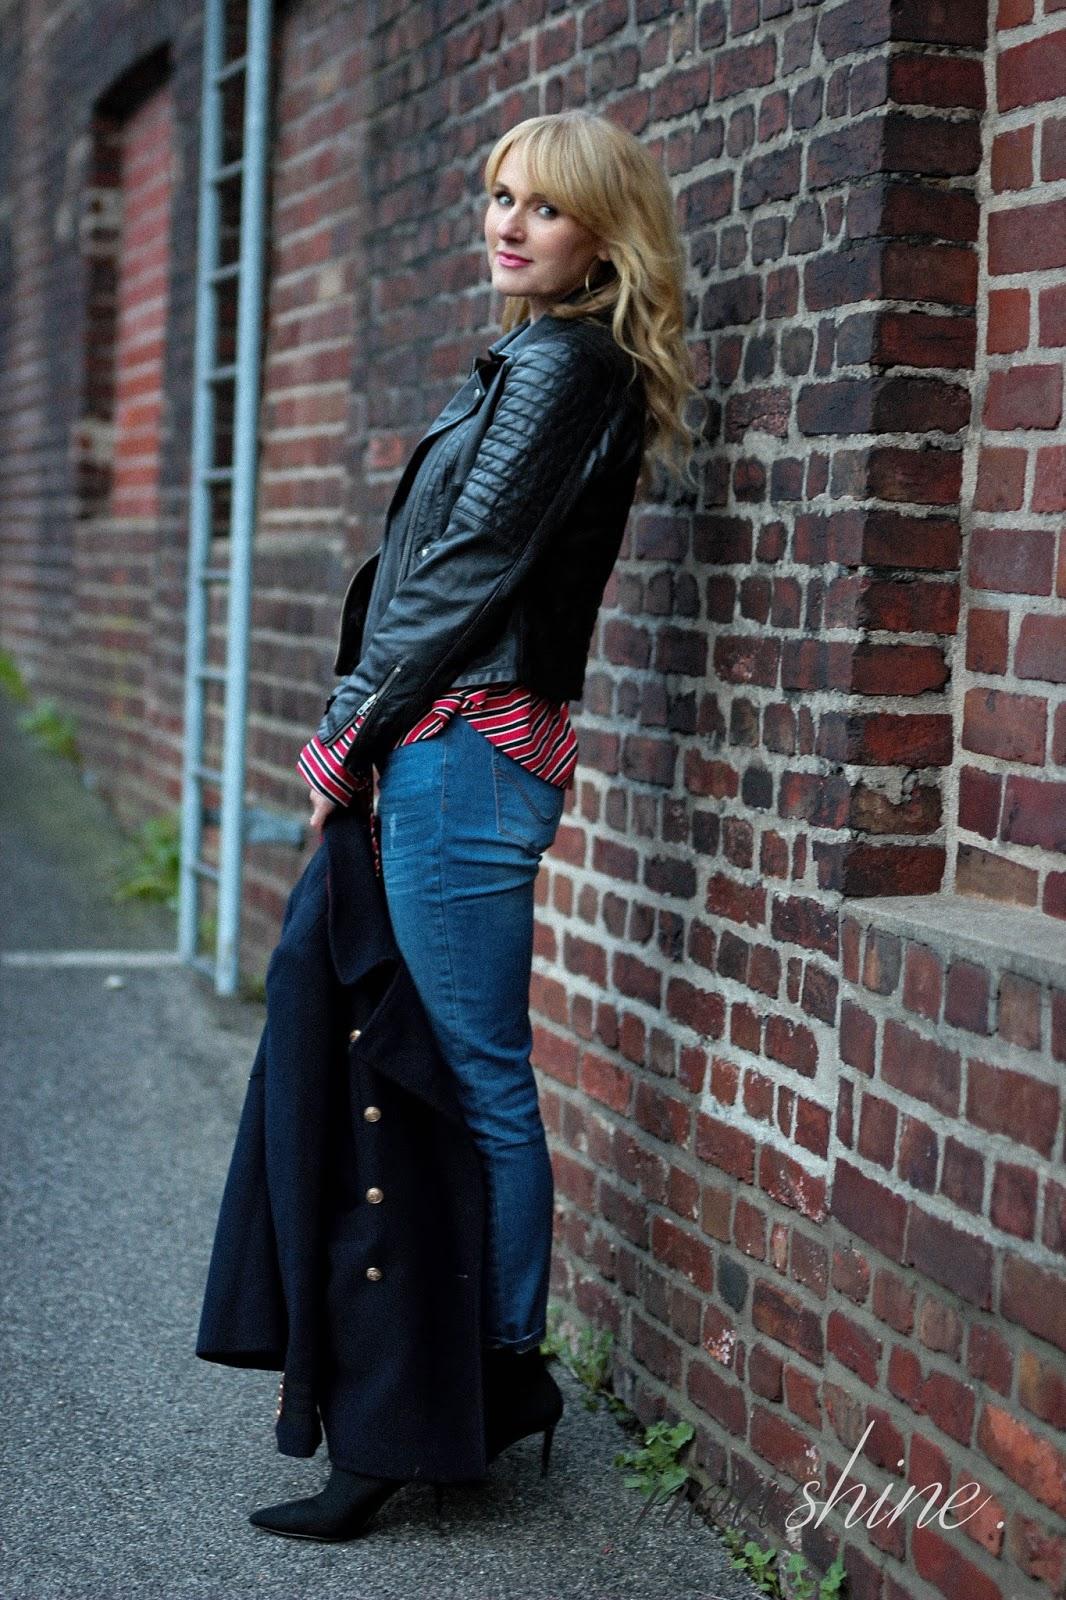 Nowshine trägt Lederjacke im Bikerstil plus Winterjacke ü40 Mode Blog